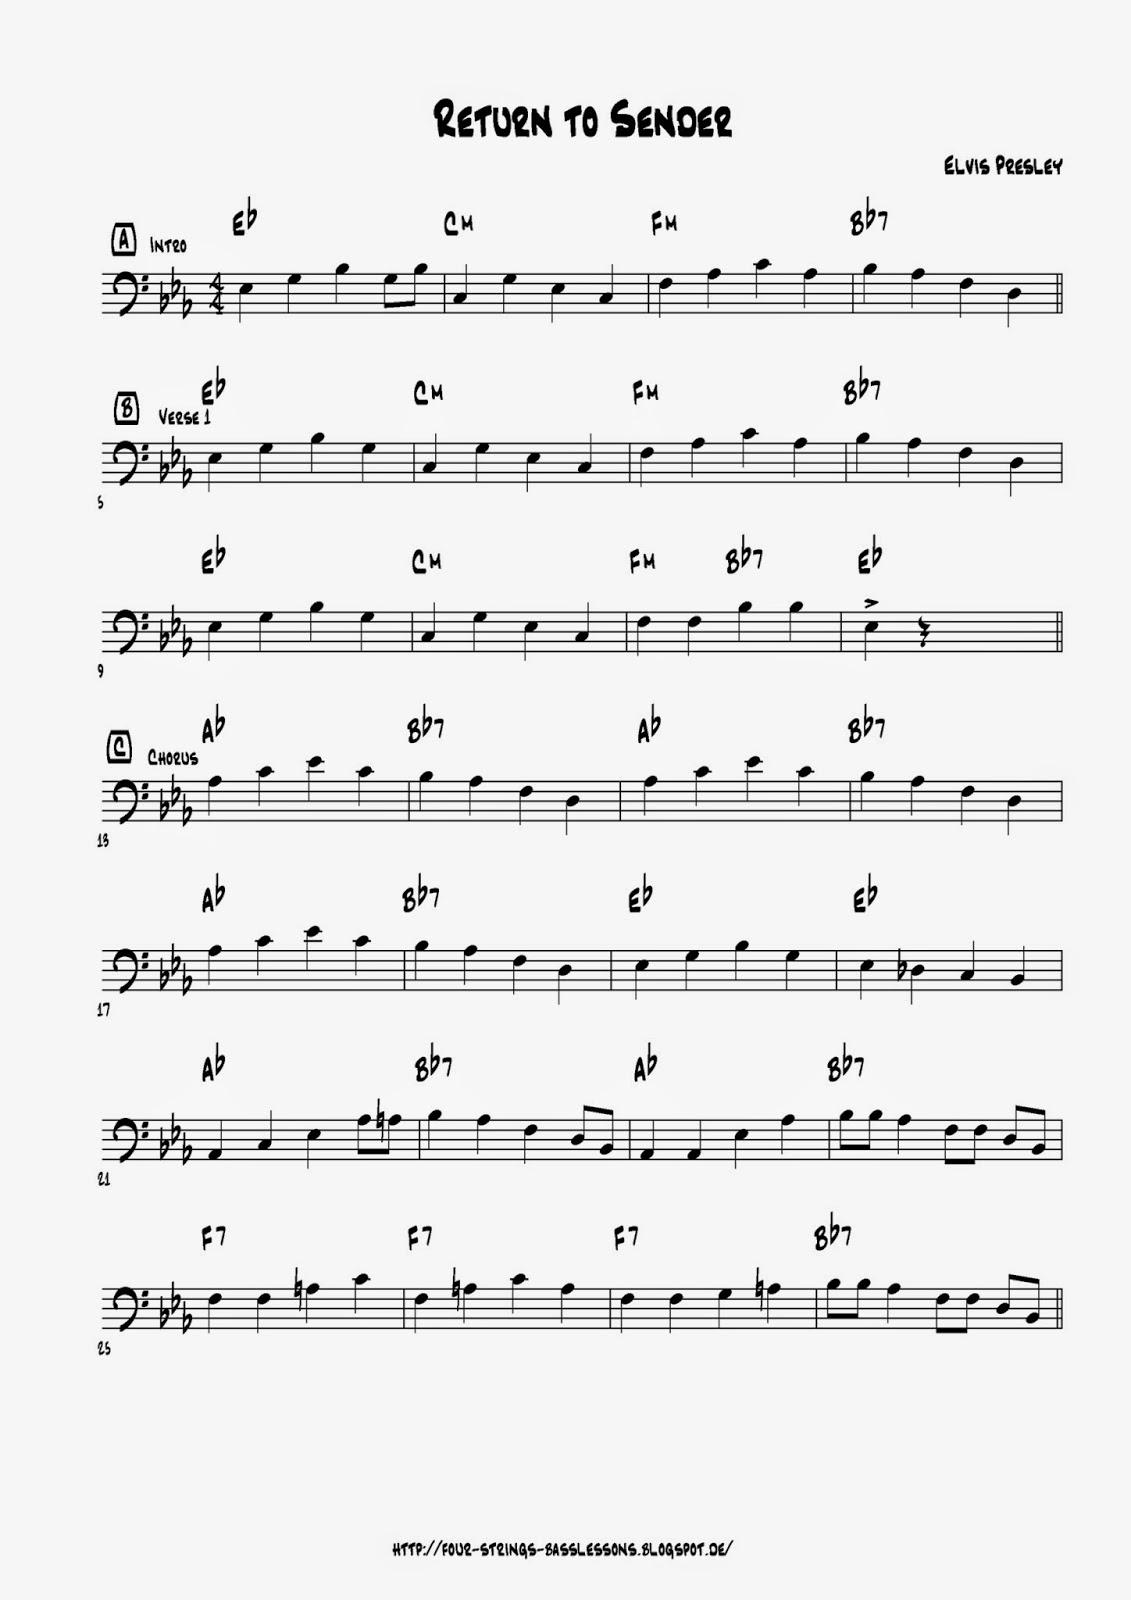 james jamerson bass lines pdf